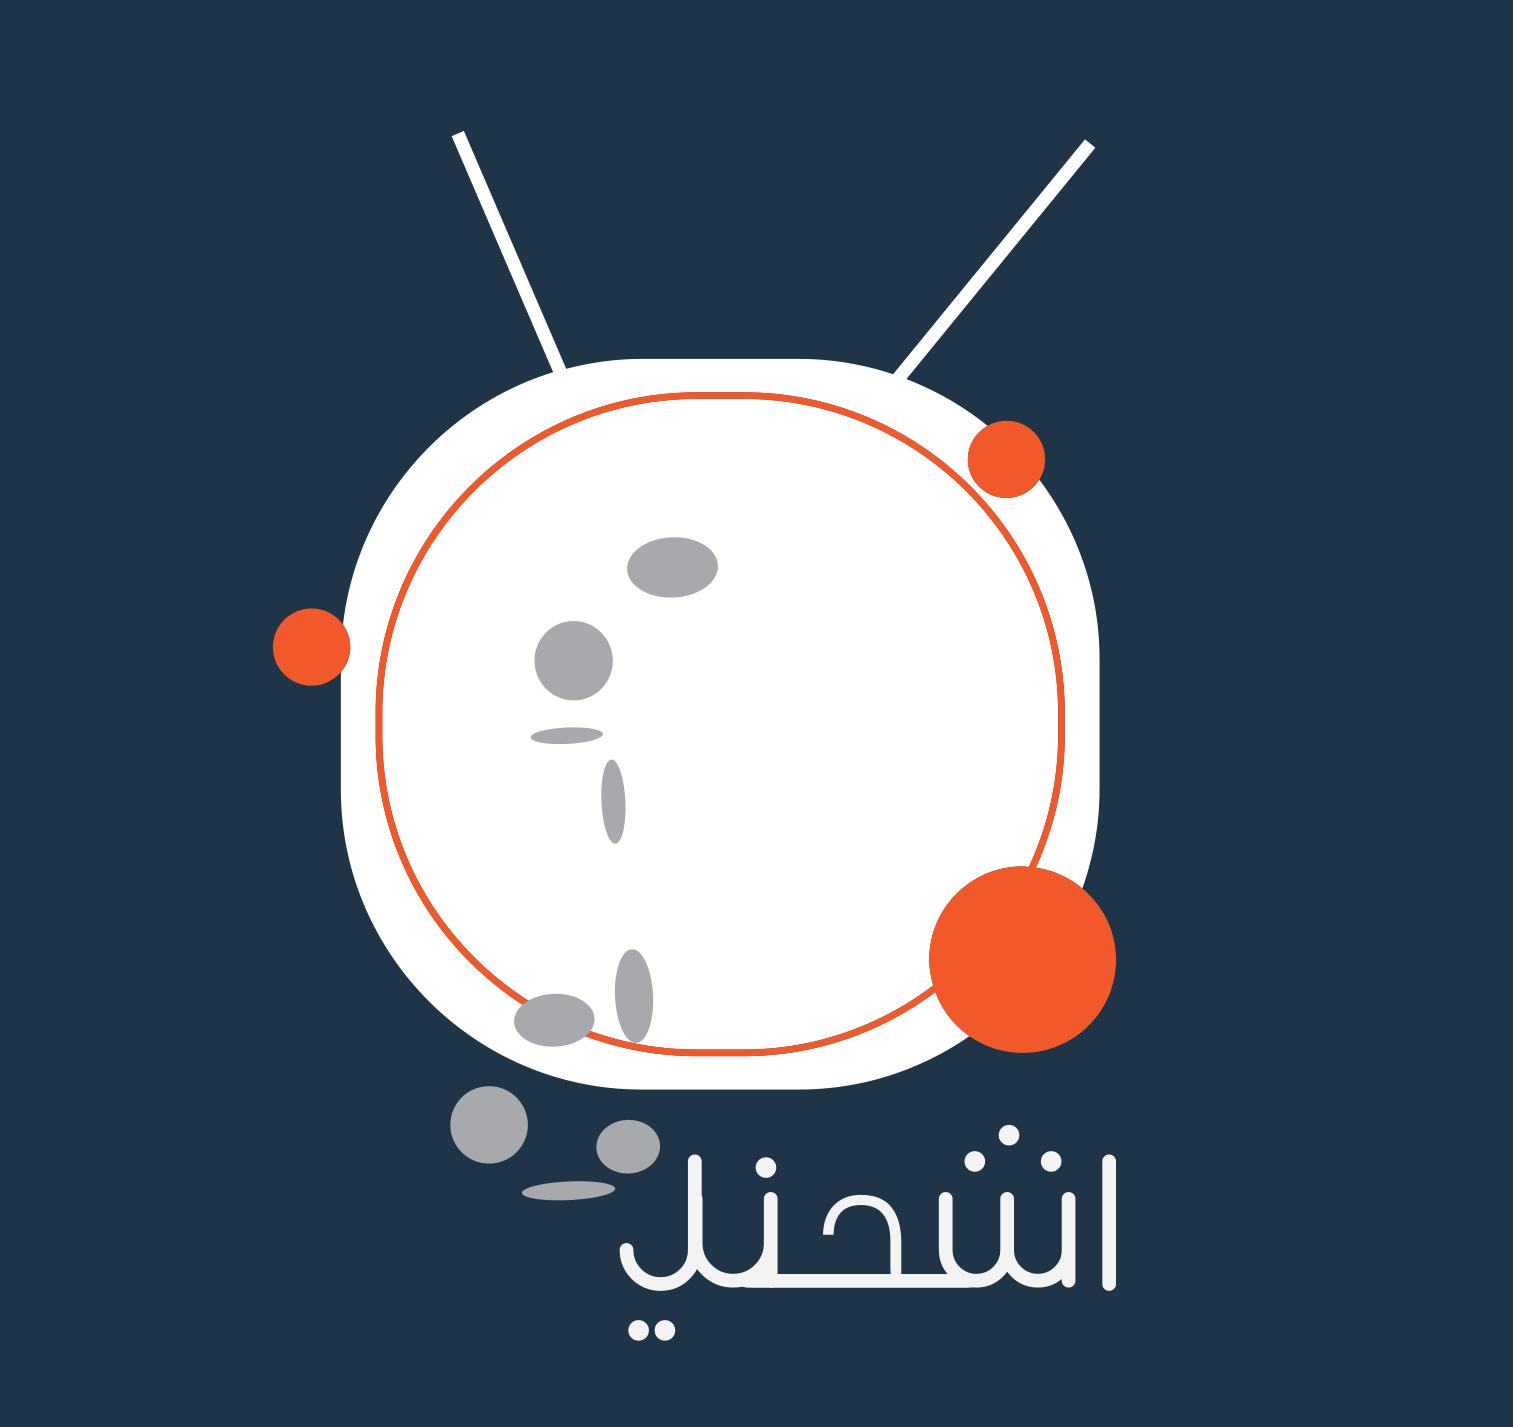 esh7anle logo version 2 by momenarts